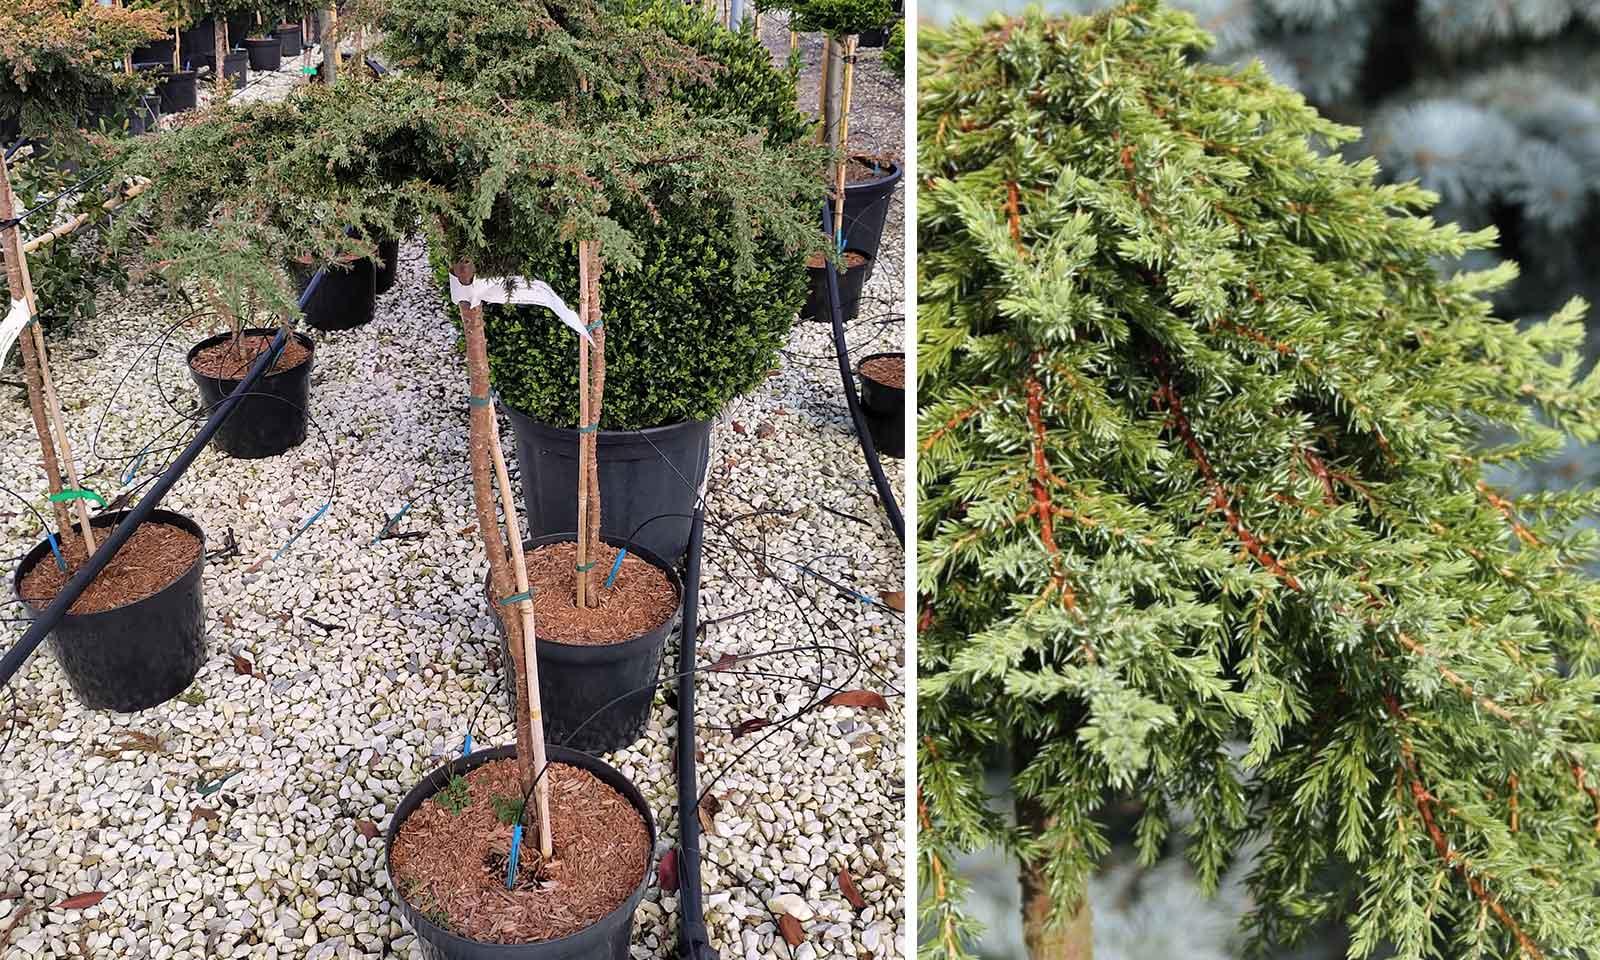 Juniperus Communis 'Greenmantle' ('Greenmantle' Common Juniper) - Half Standard